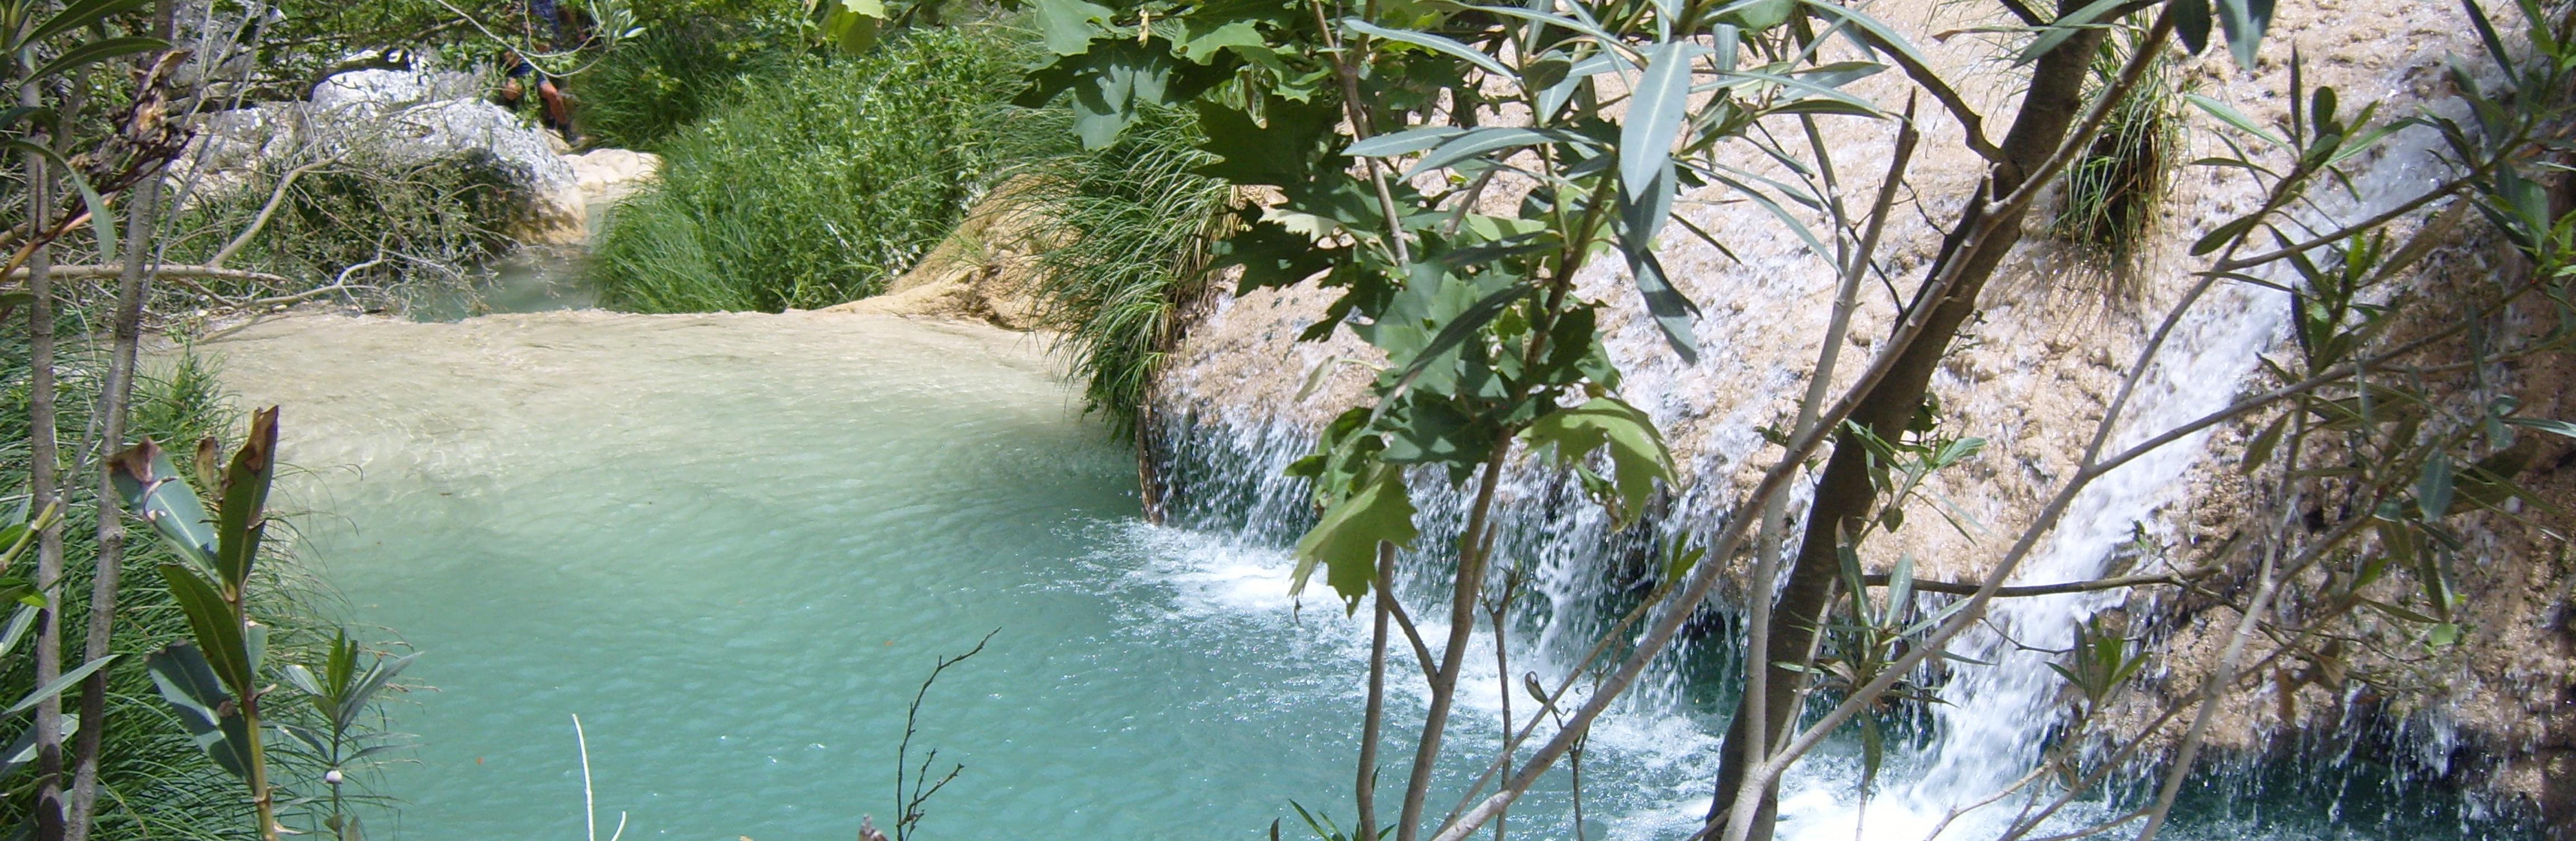 banner_omgeving_polilimniowatervallen